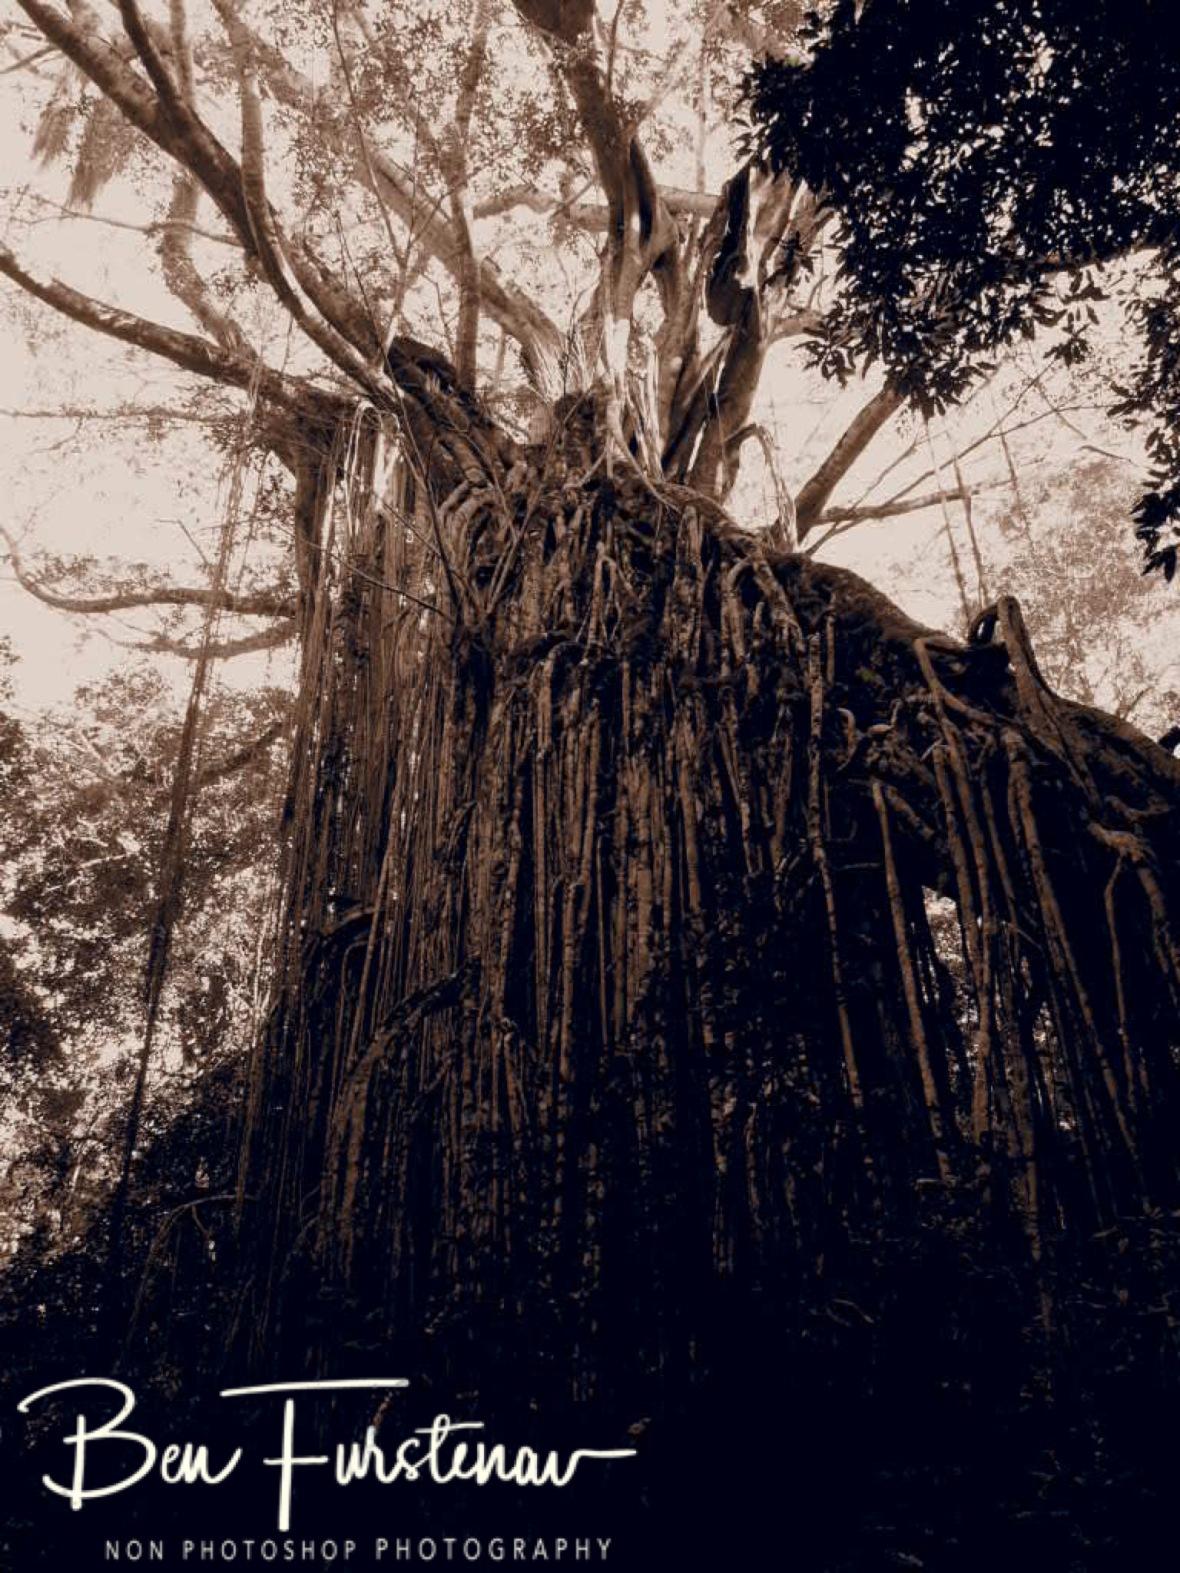 Curtain Fig Tree in sepia, Atherton Tablelands, Far North Queensland, Australia